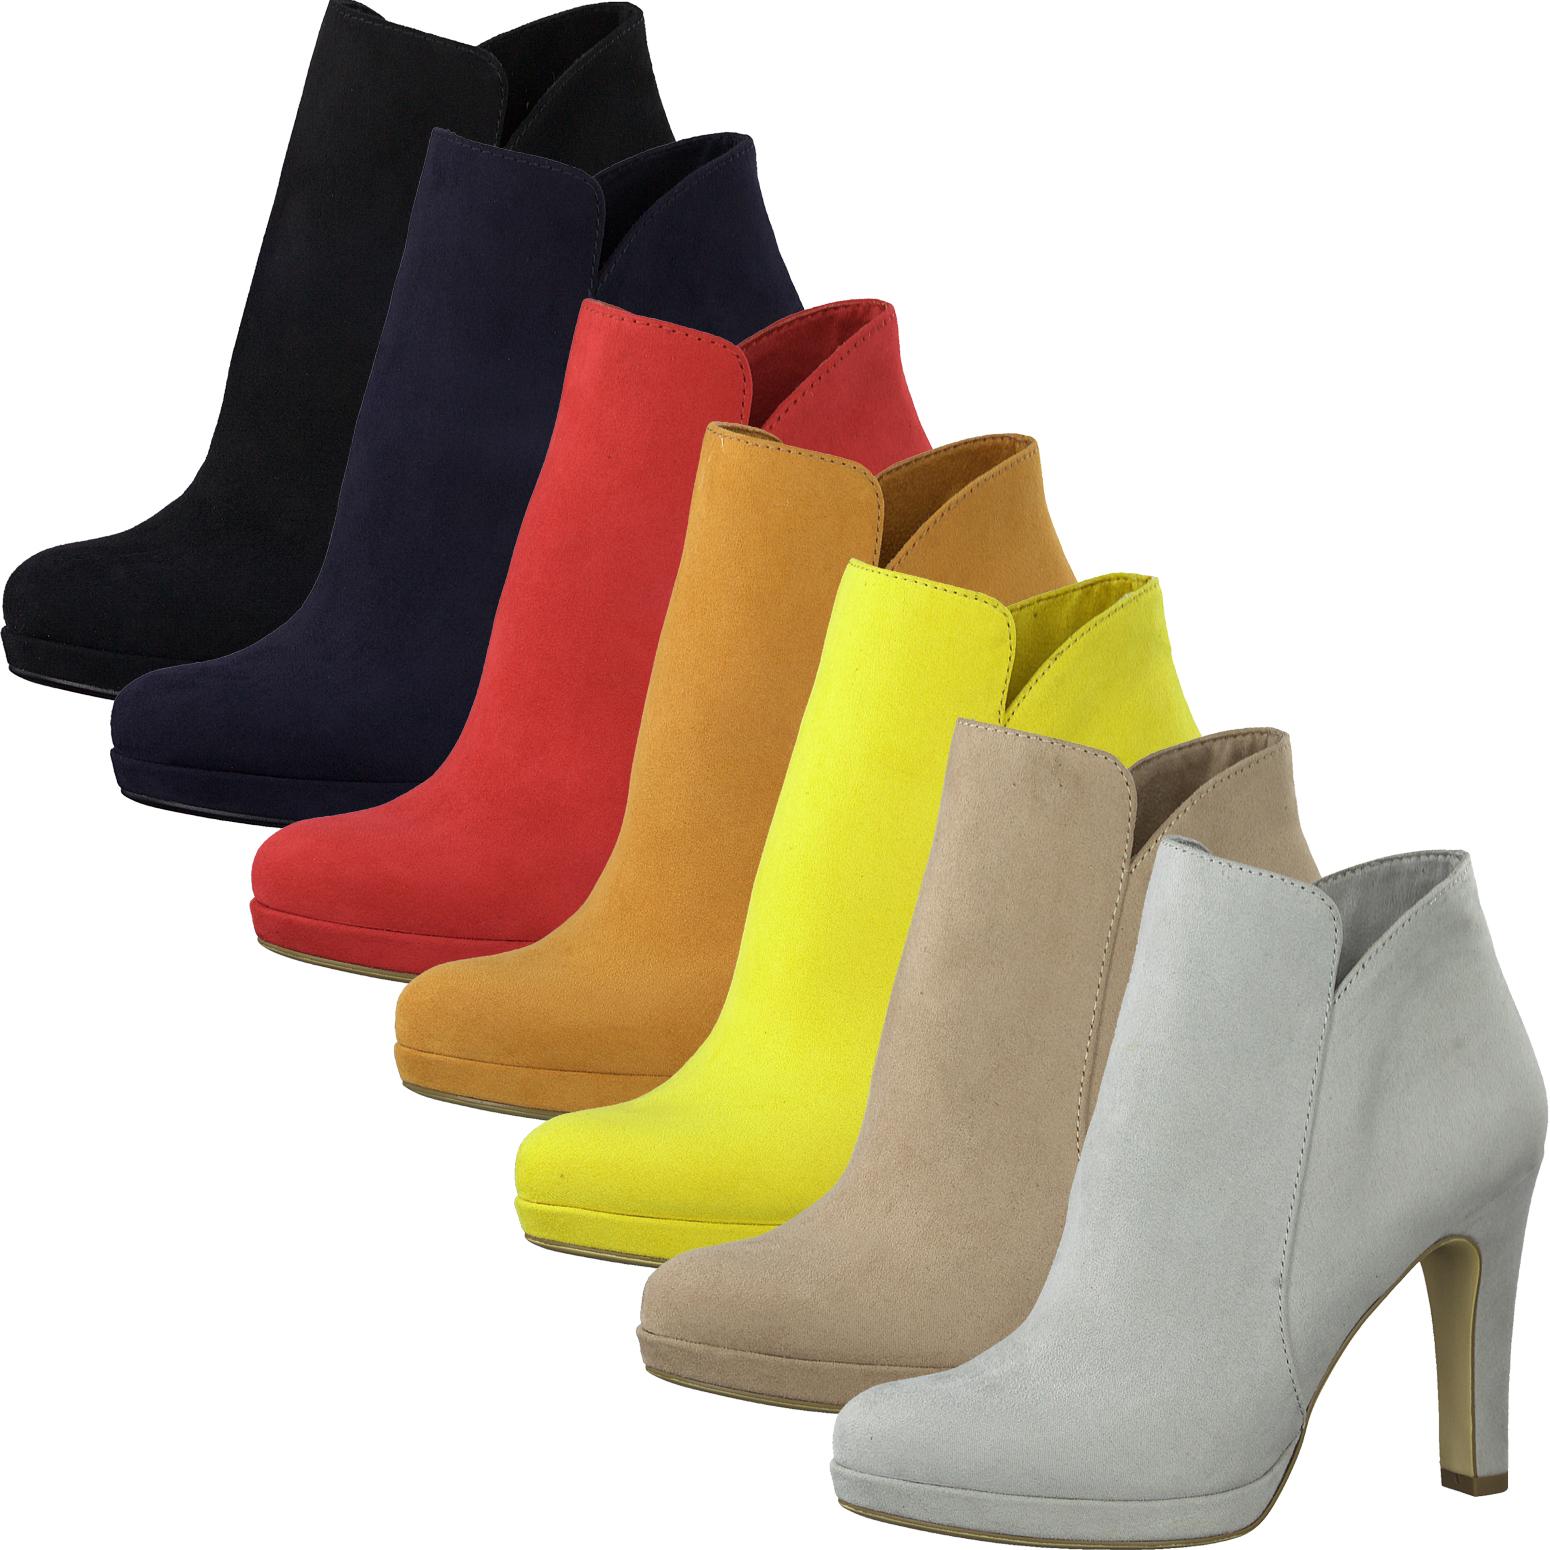 Tamaris 1 25316 24 Damen Schuhe Stiefeletten Plateau High Heel